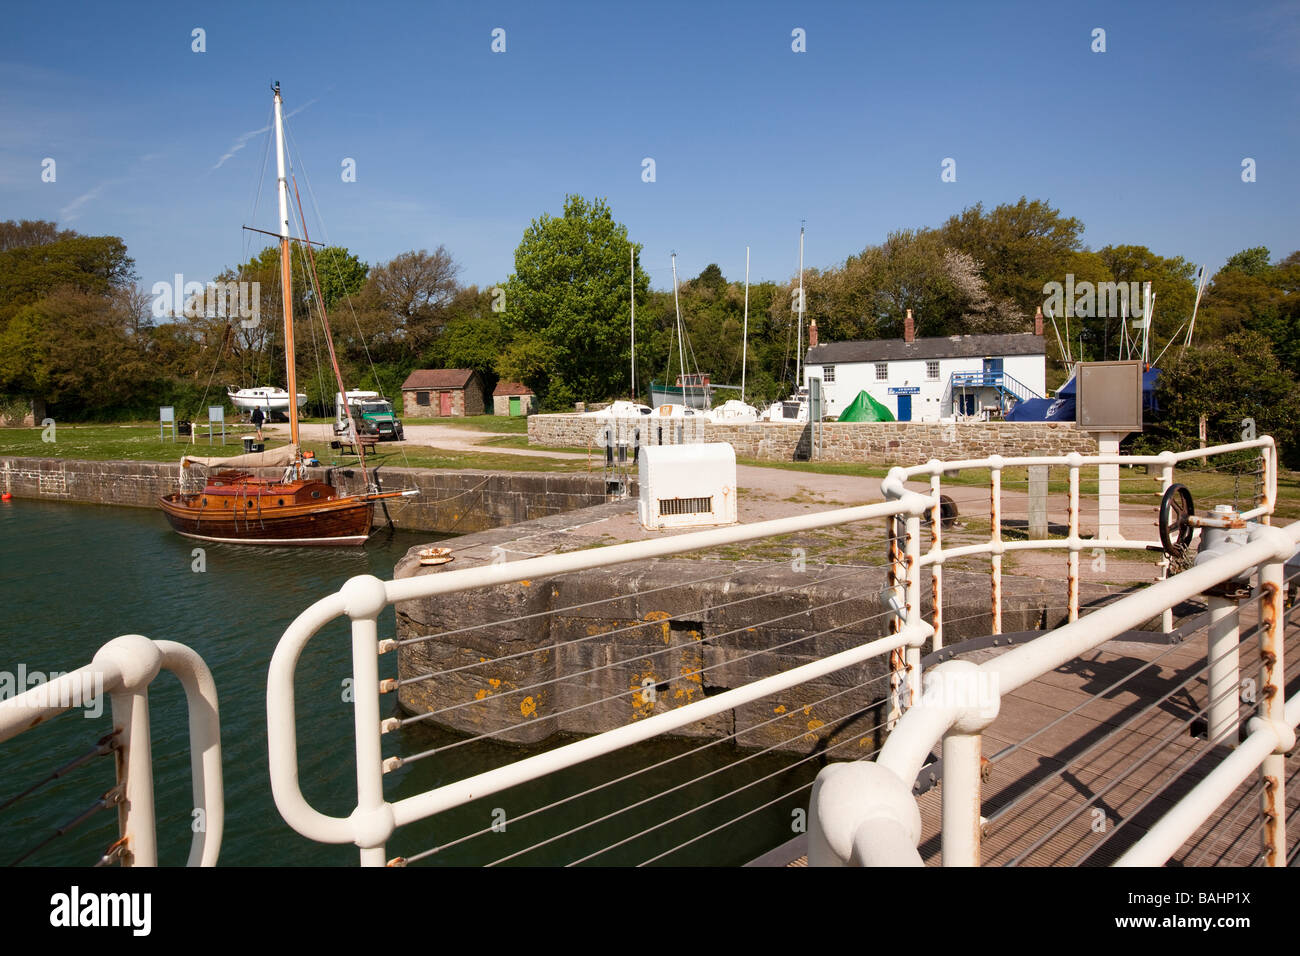 UK Gloucestershire Lydney Docks harbour River Lyd lock gates for worlds second largest tidal range - Stock Image